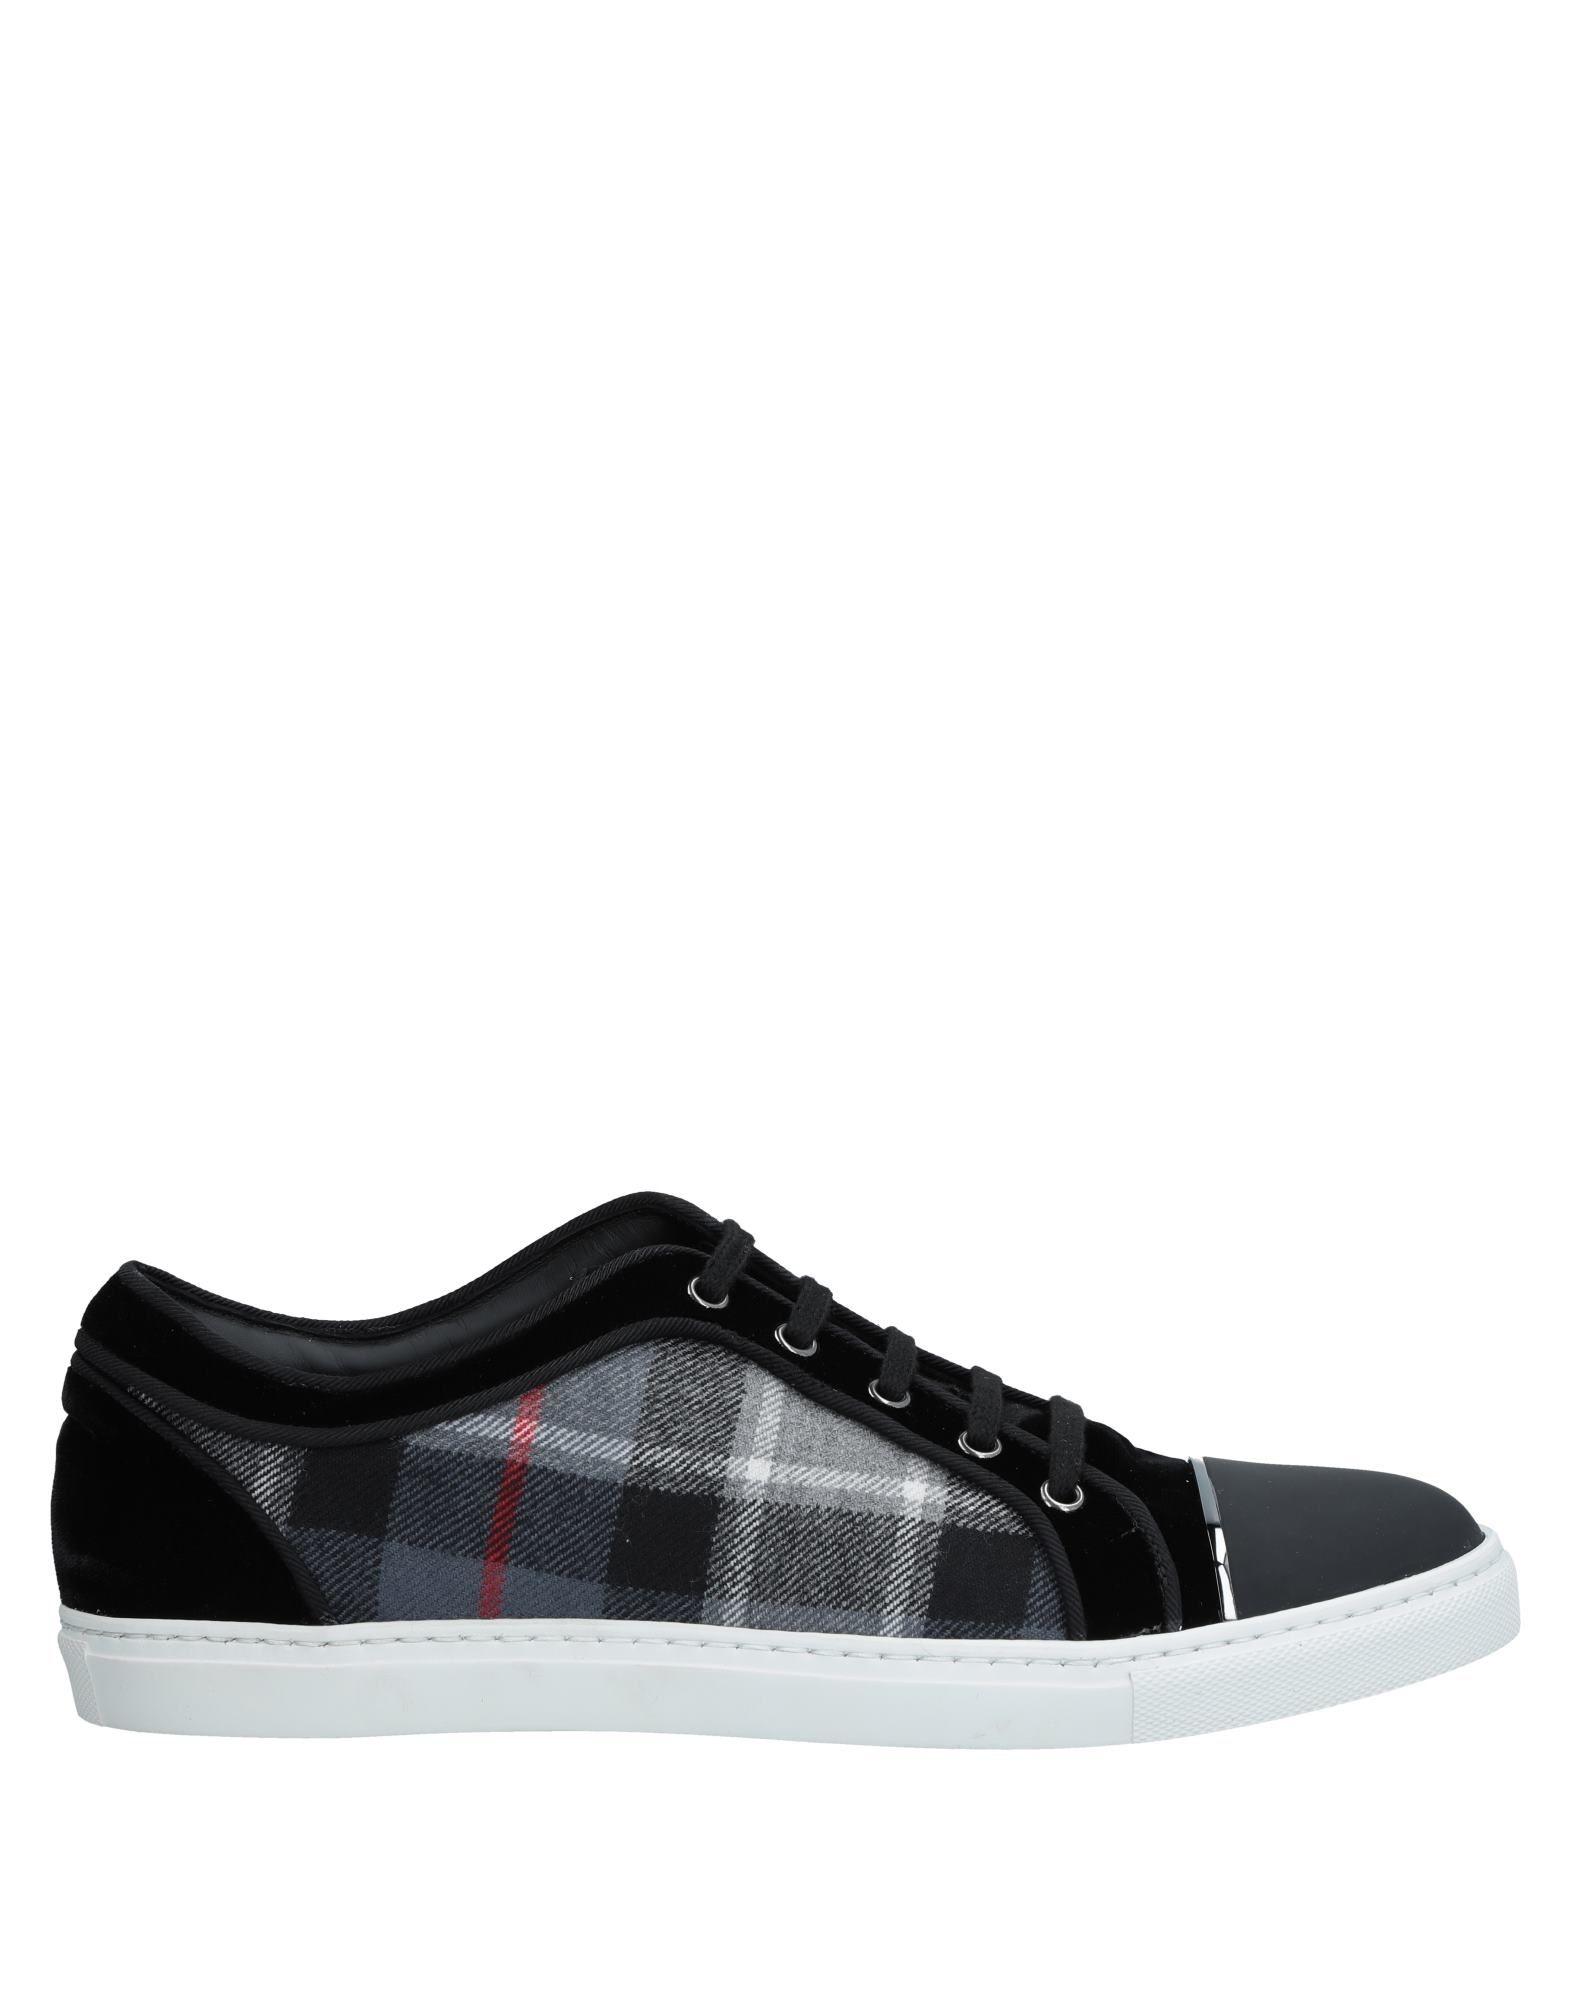 Sneakers Louis Leeman Uomo - 11542239CO